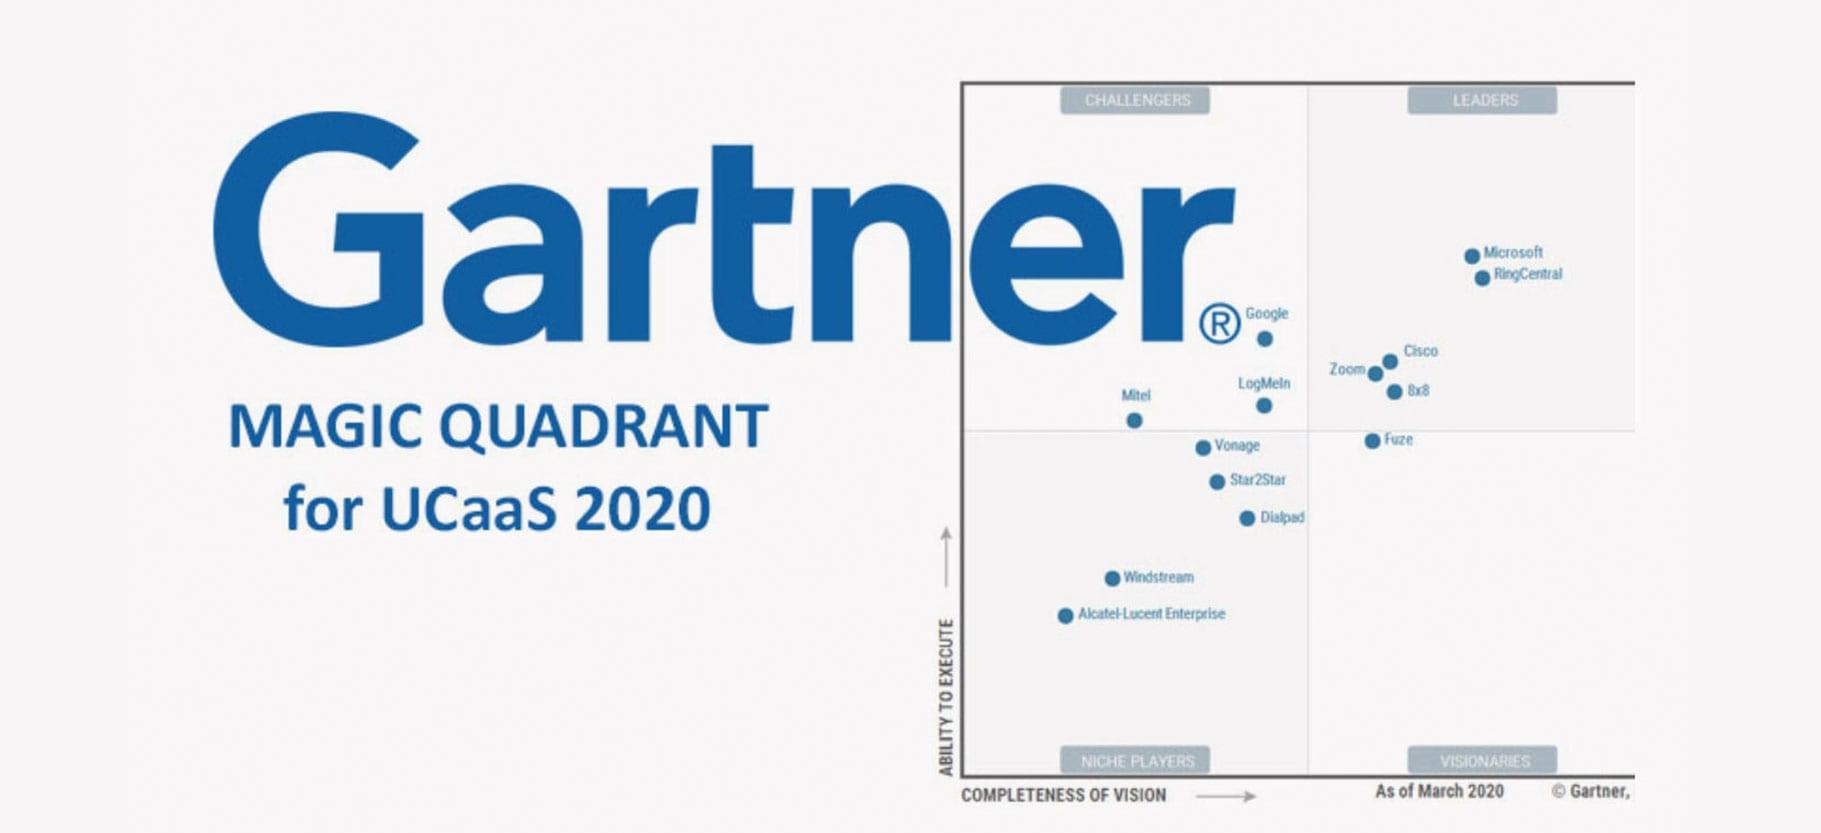 Starblue Inducted into 2019 UCaaS Gartner Magic Quadrant